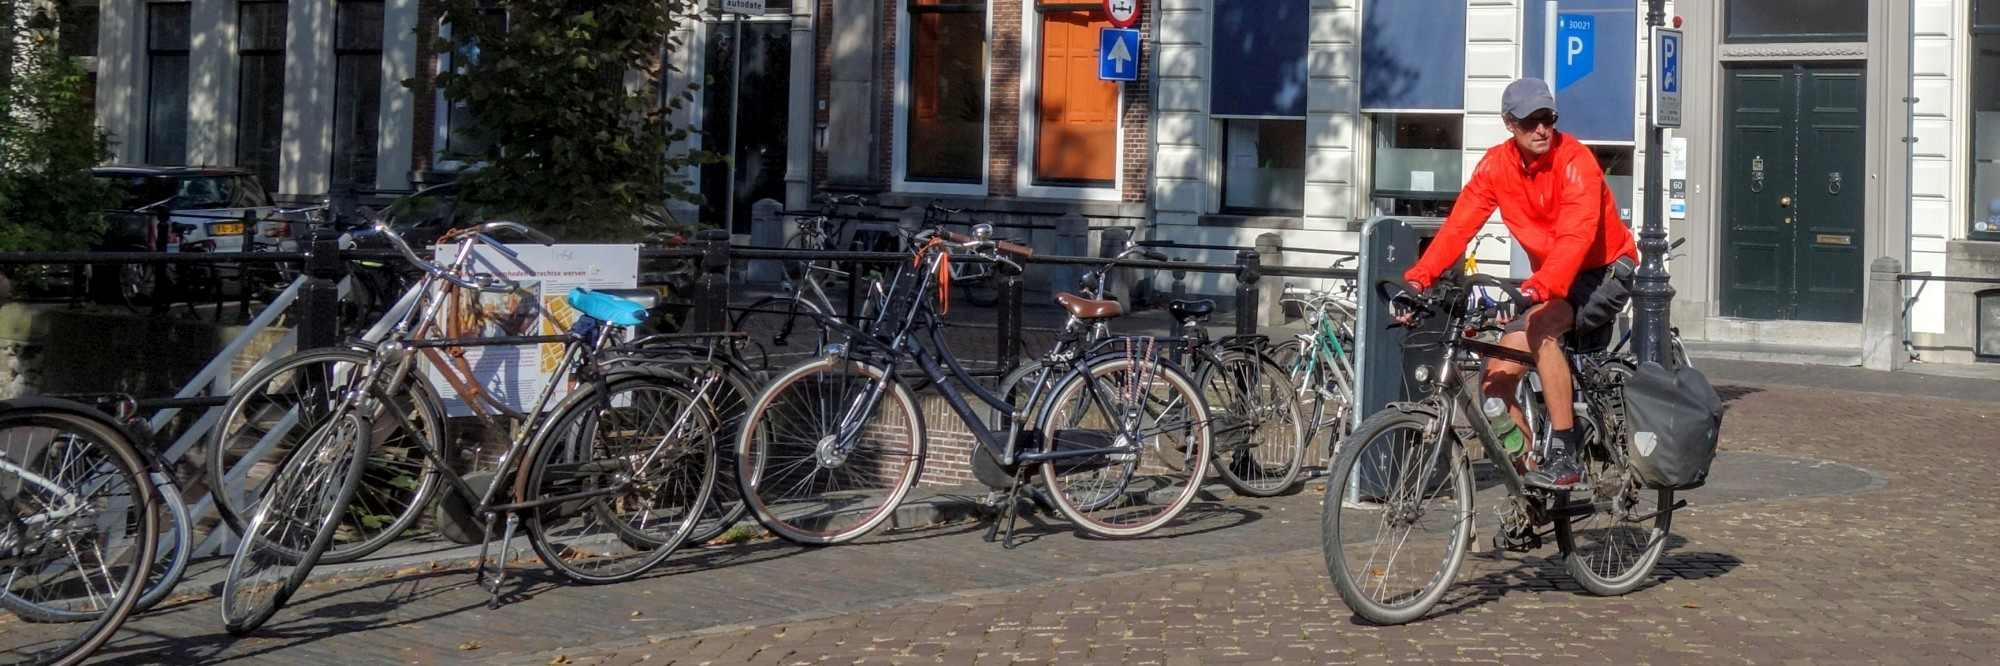 header foto fietsroute utrecht